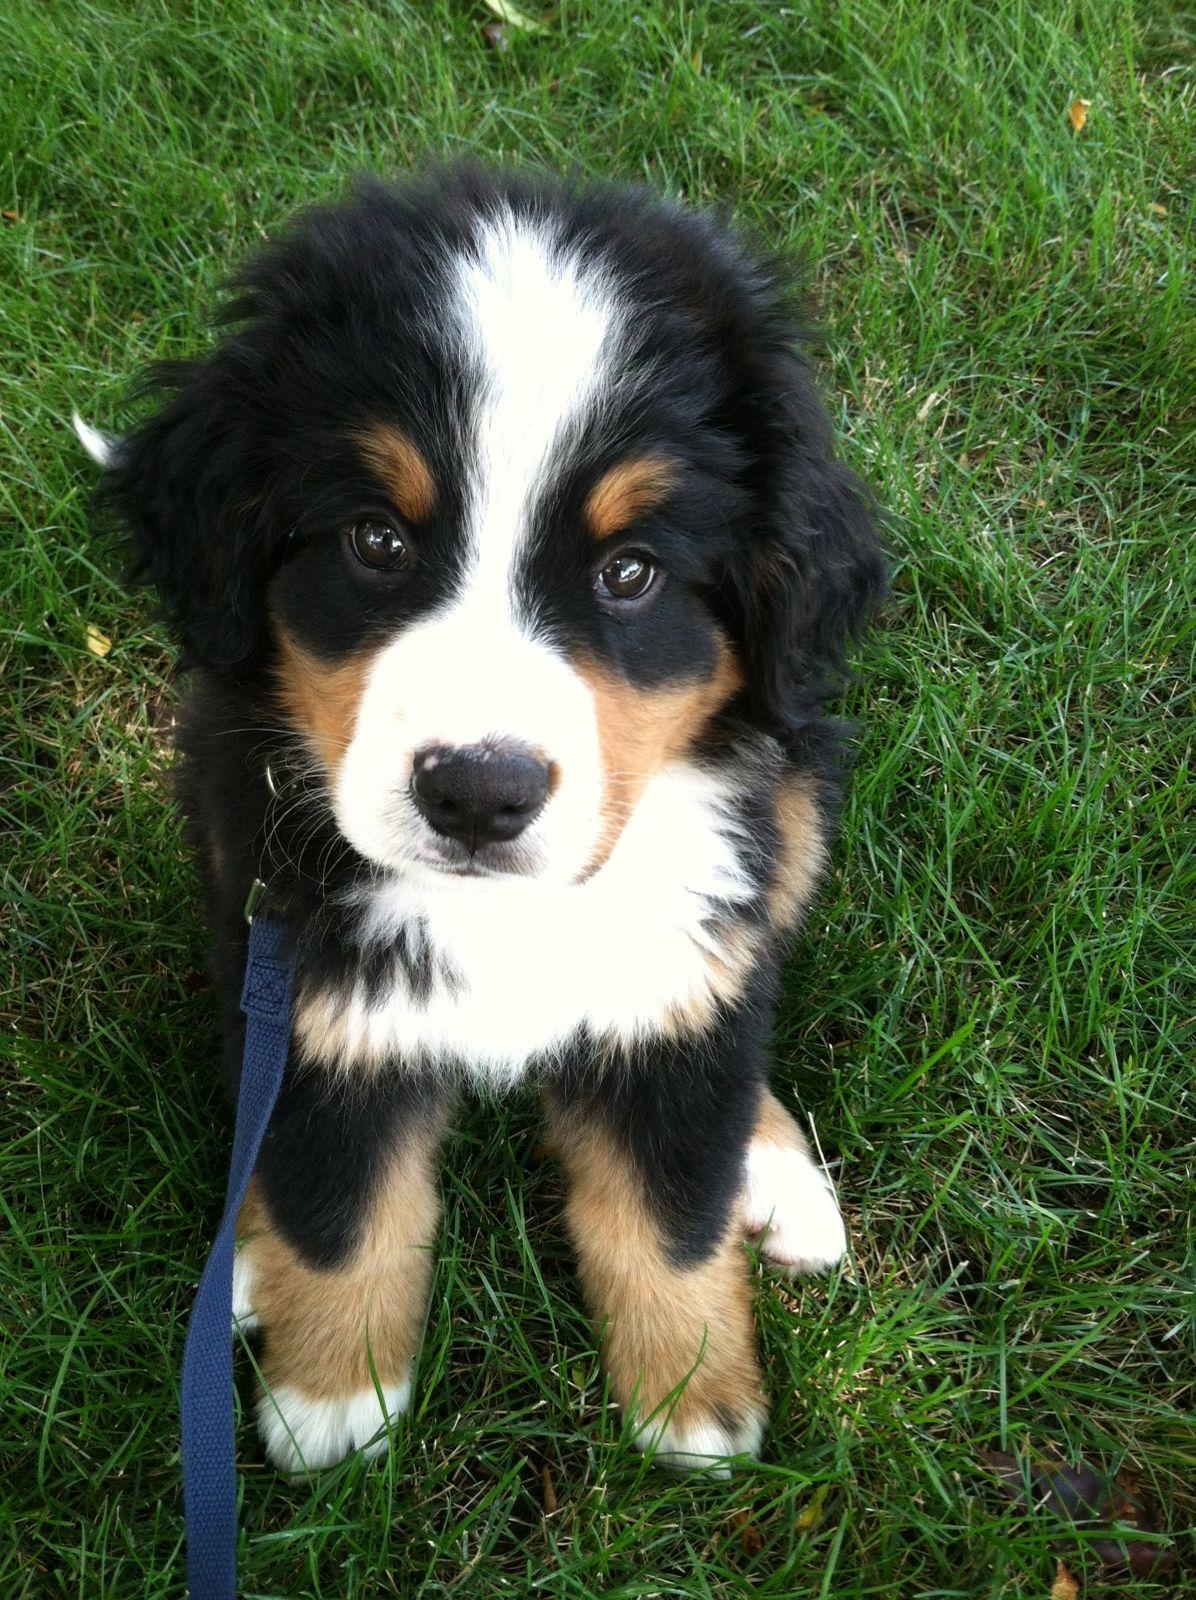 Bernese Mountain Dog Puppy Sooo Cute Want One Baby Dogs Bernese Mountain Dog Puppy Mountain Dogs